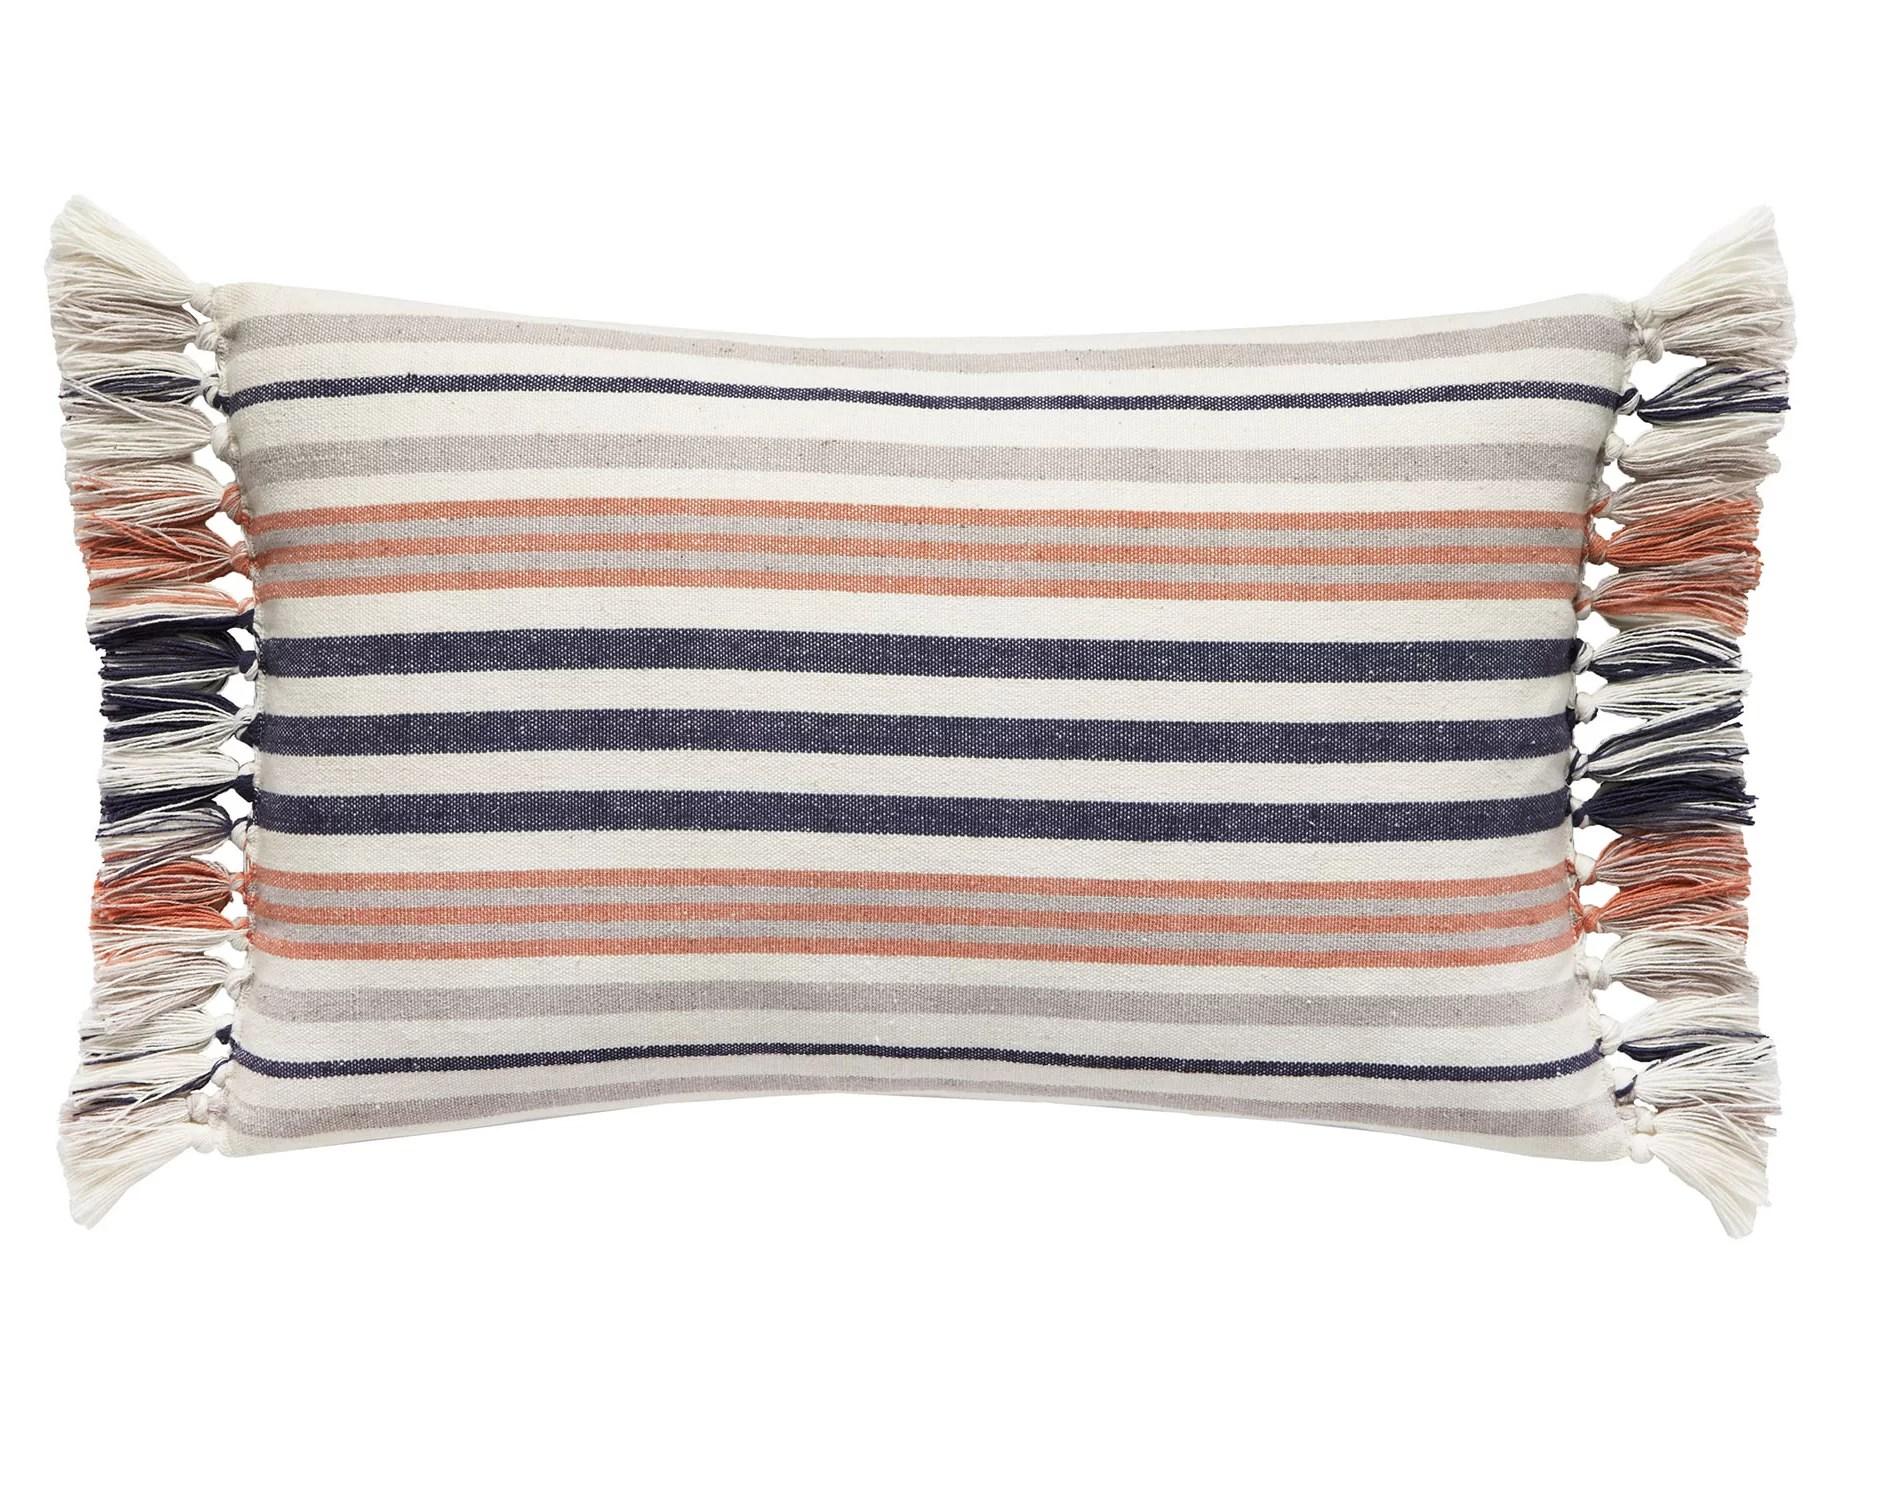 yarn dyed oblong cotton striped lumbar pillow